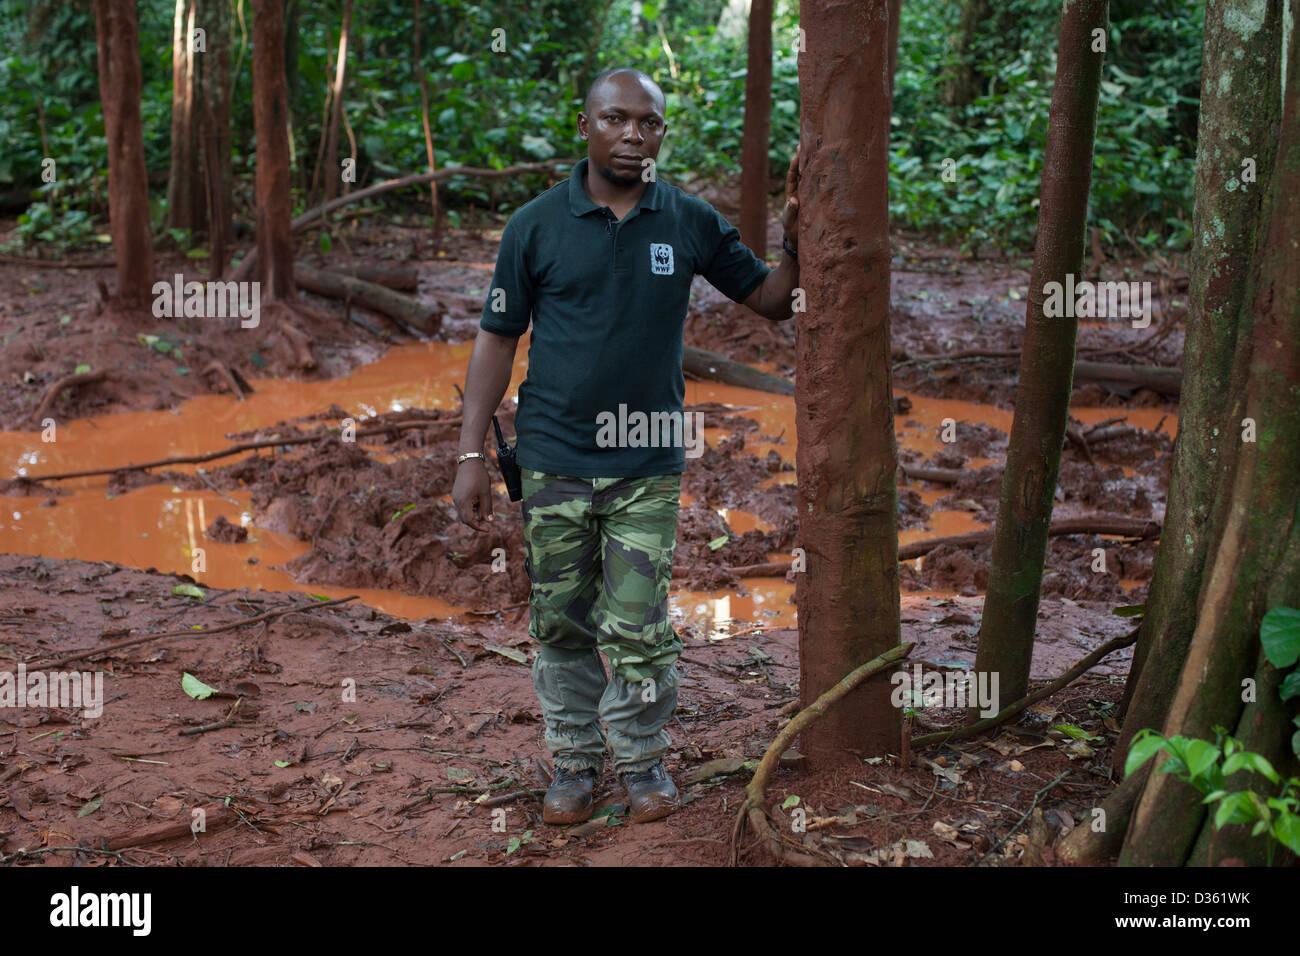 CAMEROON, 1st October 2012:  Ekodek Gatien, WWF Park Ranger, at a salt lick where a female forest elephant was recently - Stock Image